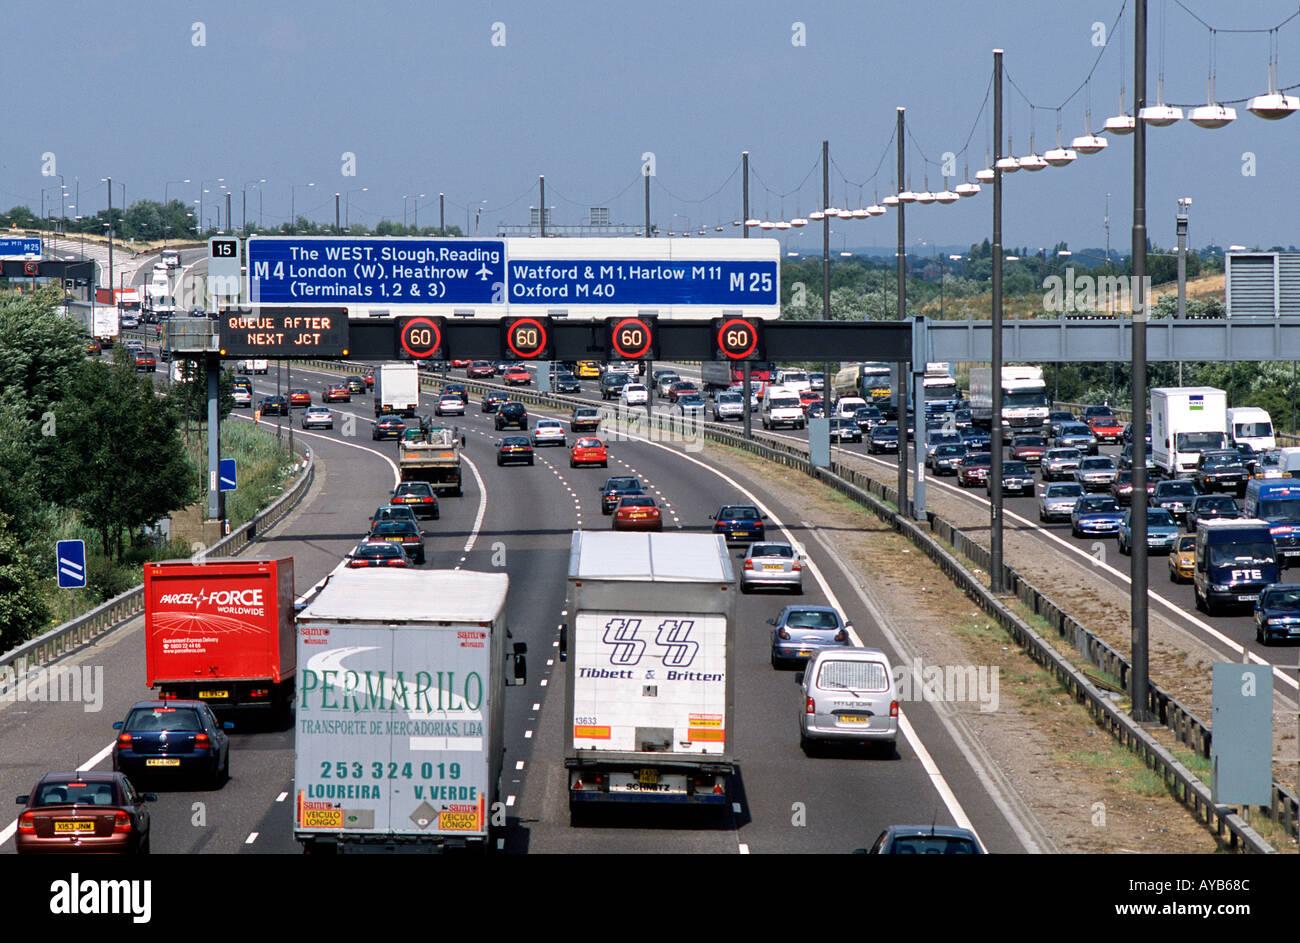 m25 traffic - photo #30